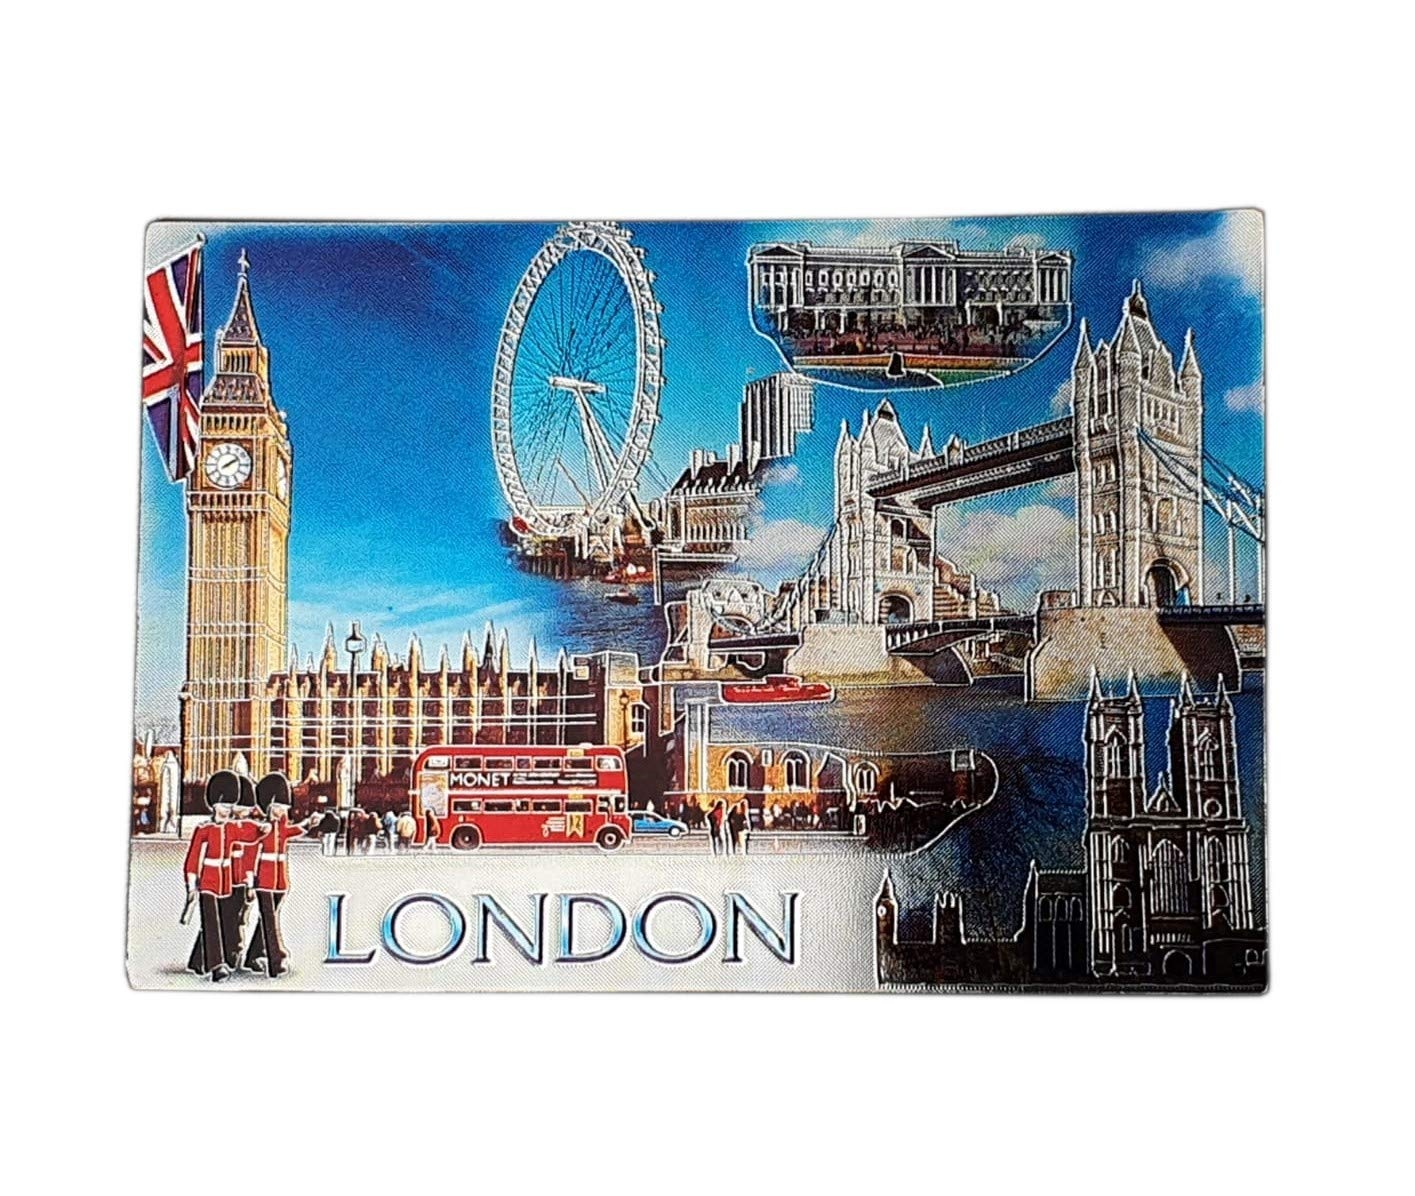 London Photo Collage Foil Fridge Magnet - Blue Sky/Big Ben/Tower Bridge/Westminster Abbey/Red Double-Decker Bus/Royal Guard/Buckingham Palace/Union Jack/British Souvenir from England UK